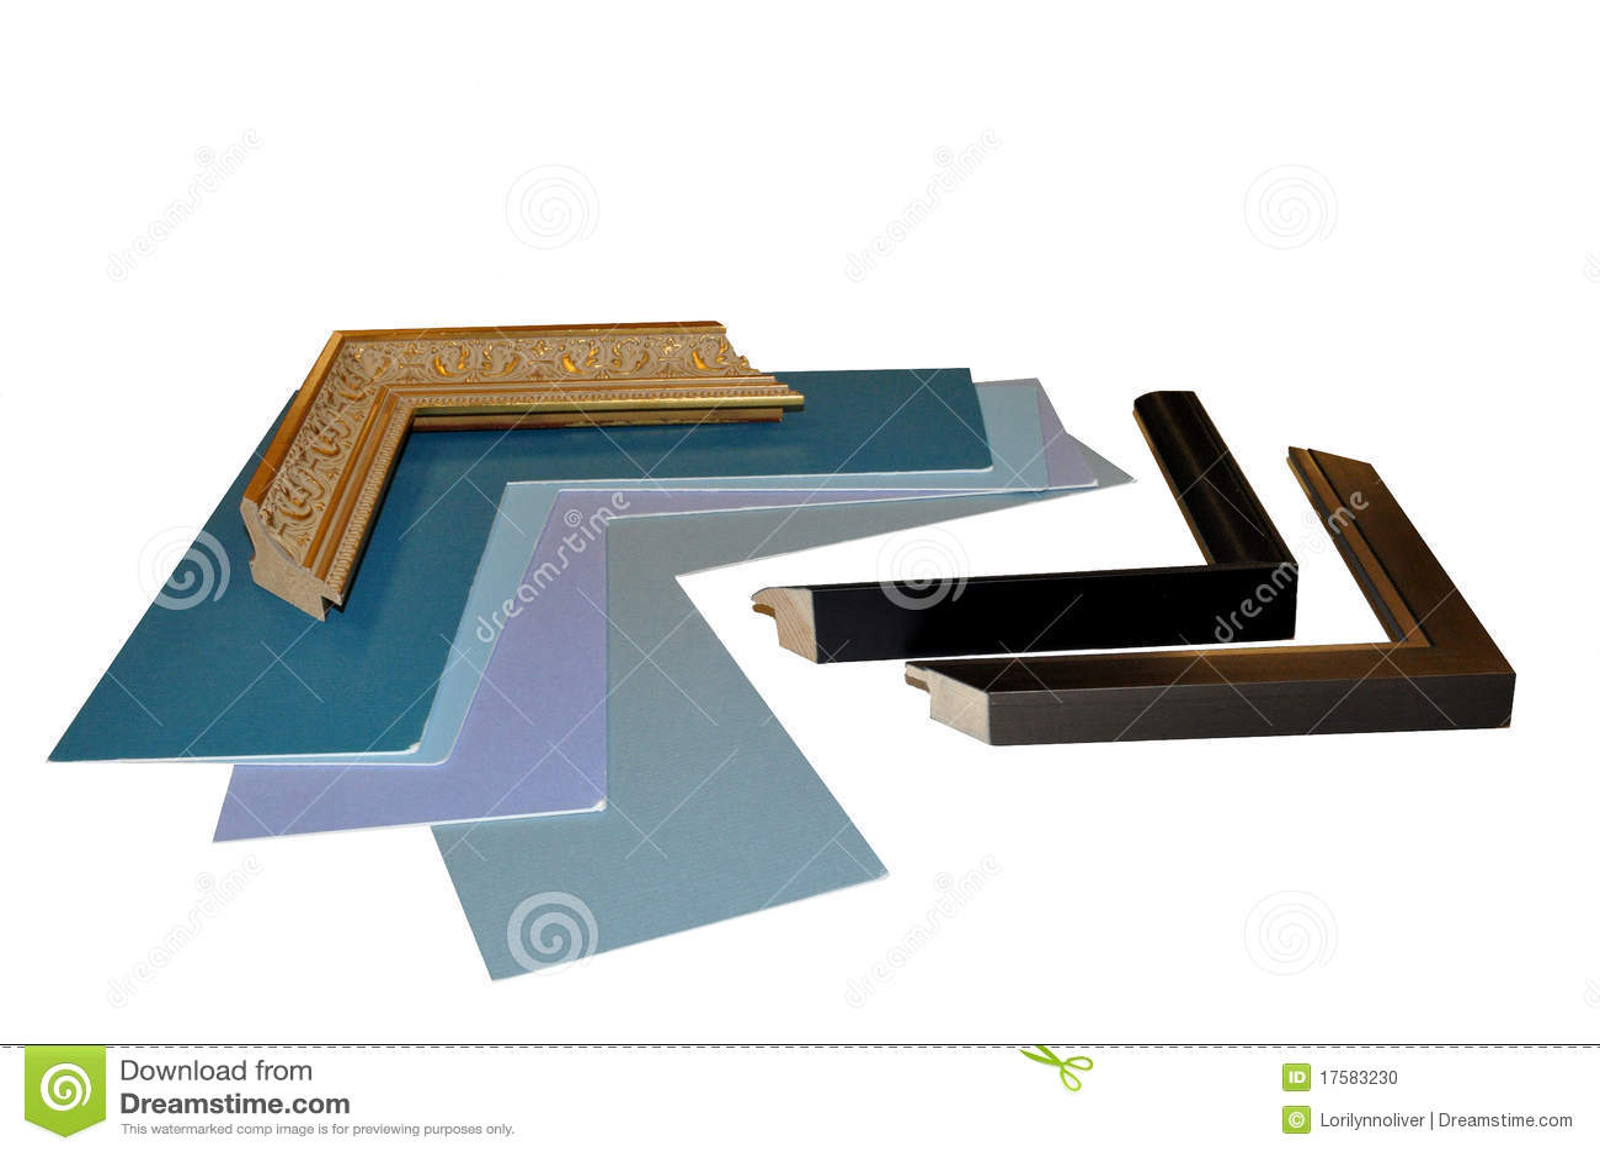 Framing supplies stock photo. Image of carpentry, framing - 17583230